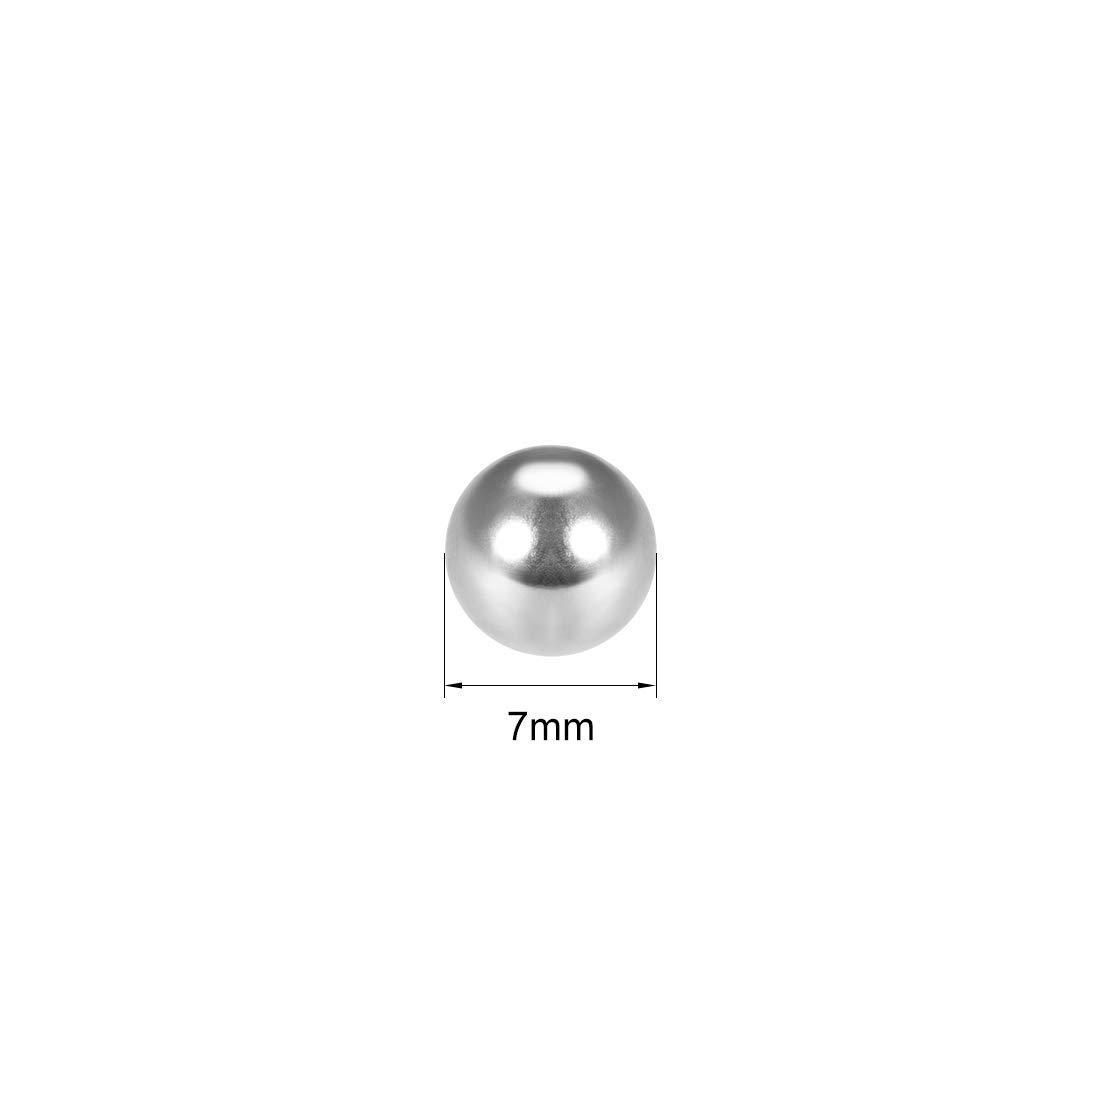 7mm G25 Chrome Steel Precision Bearing Balls 100 Pieces